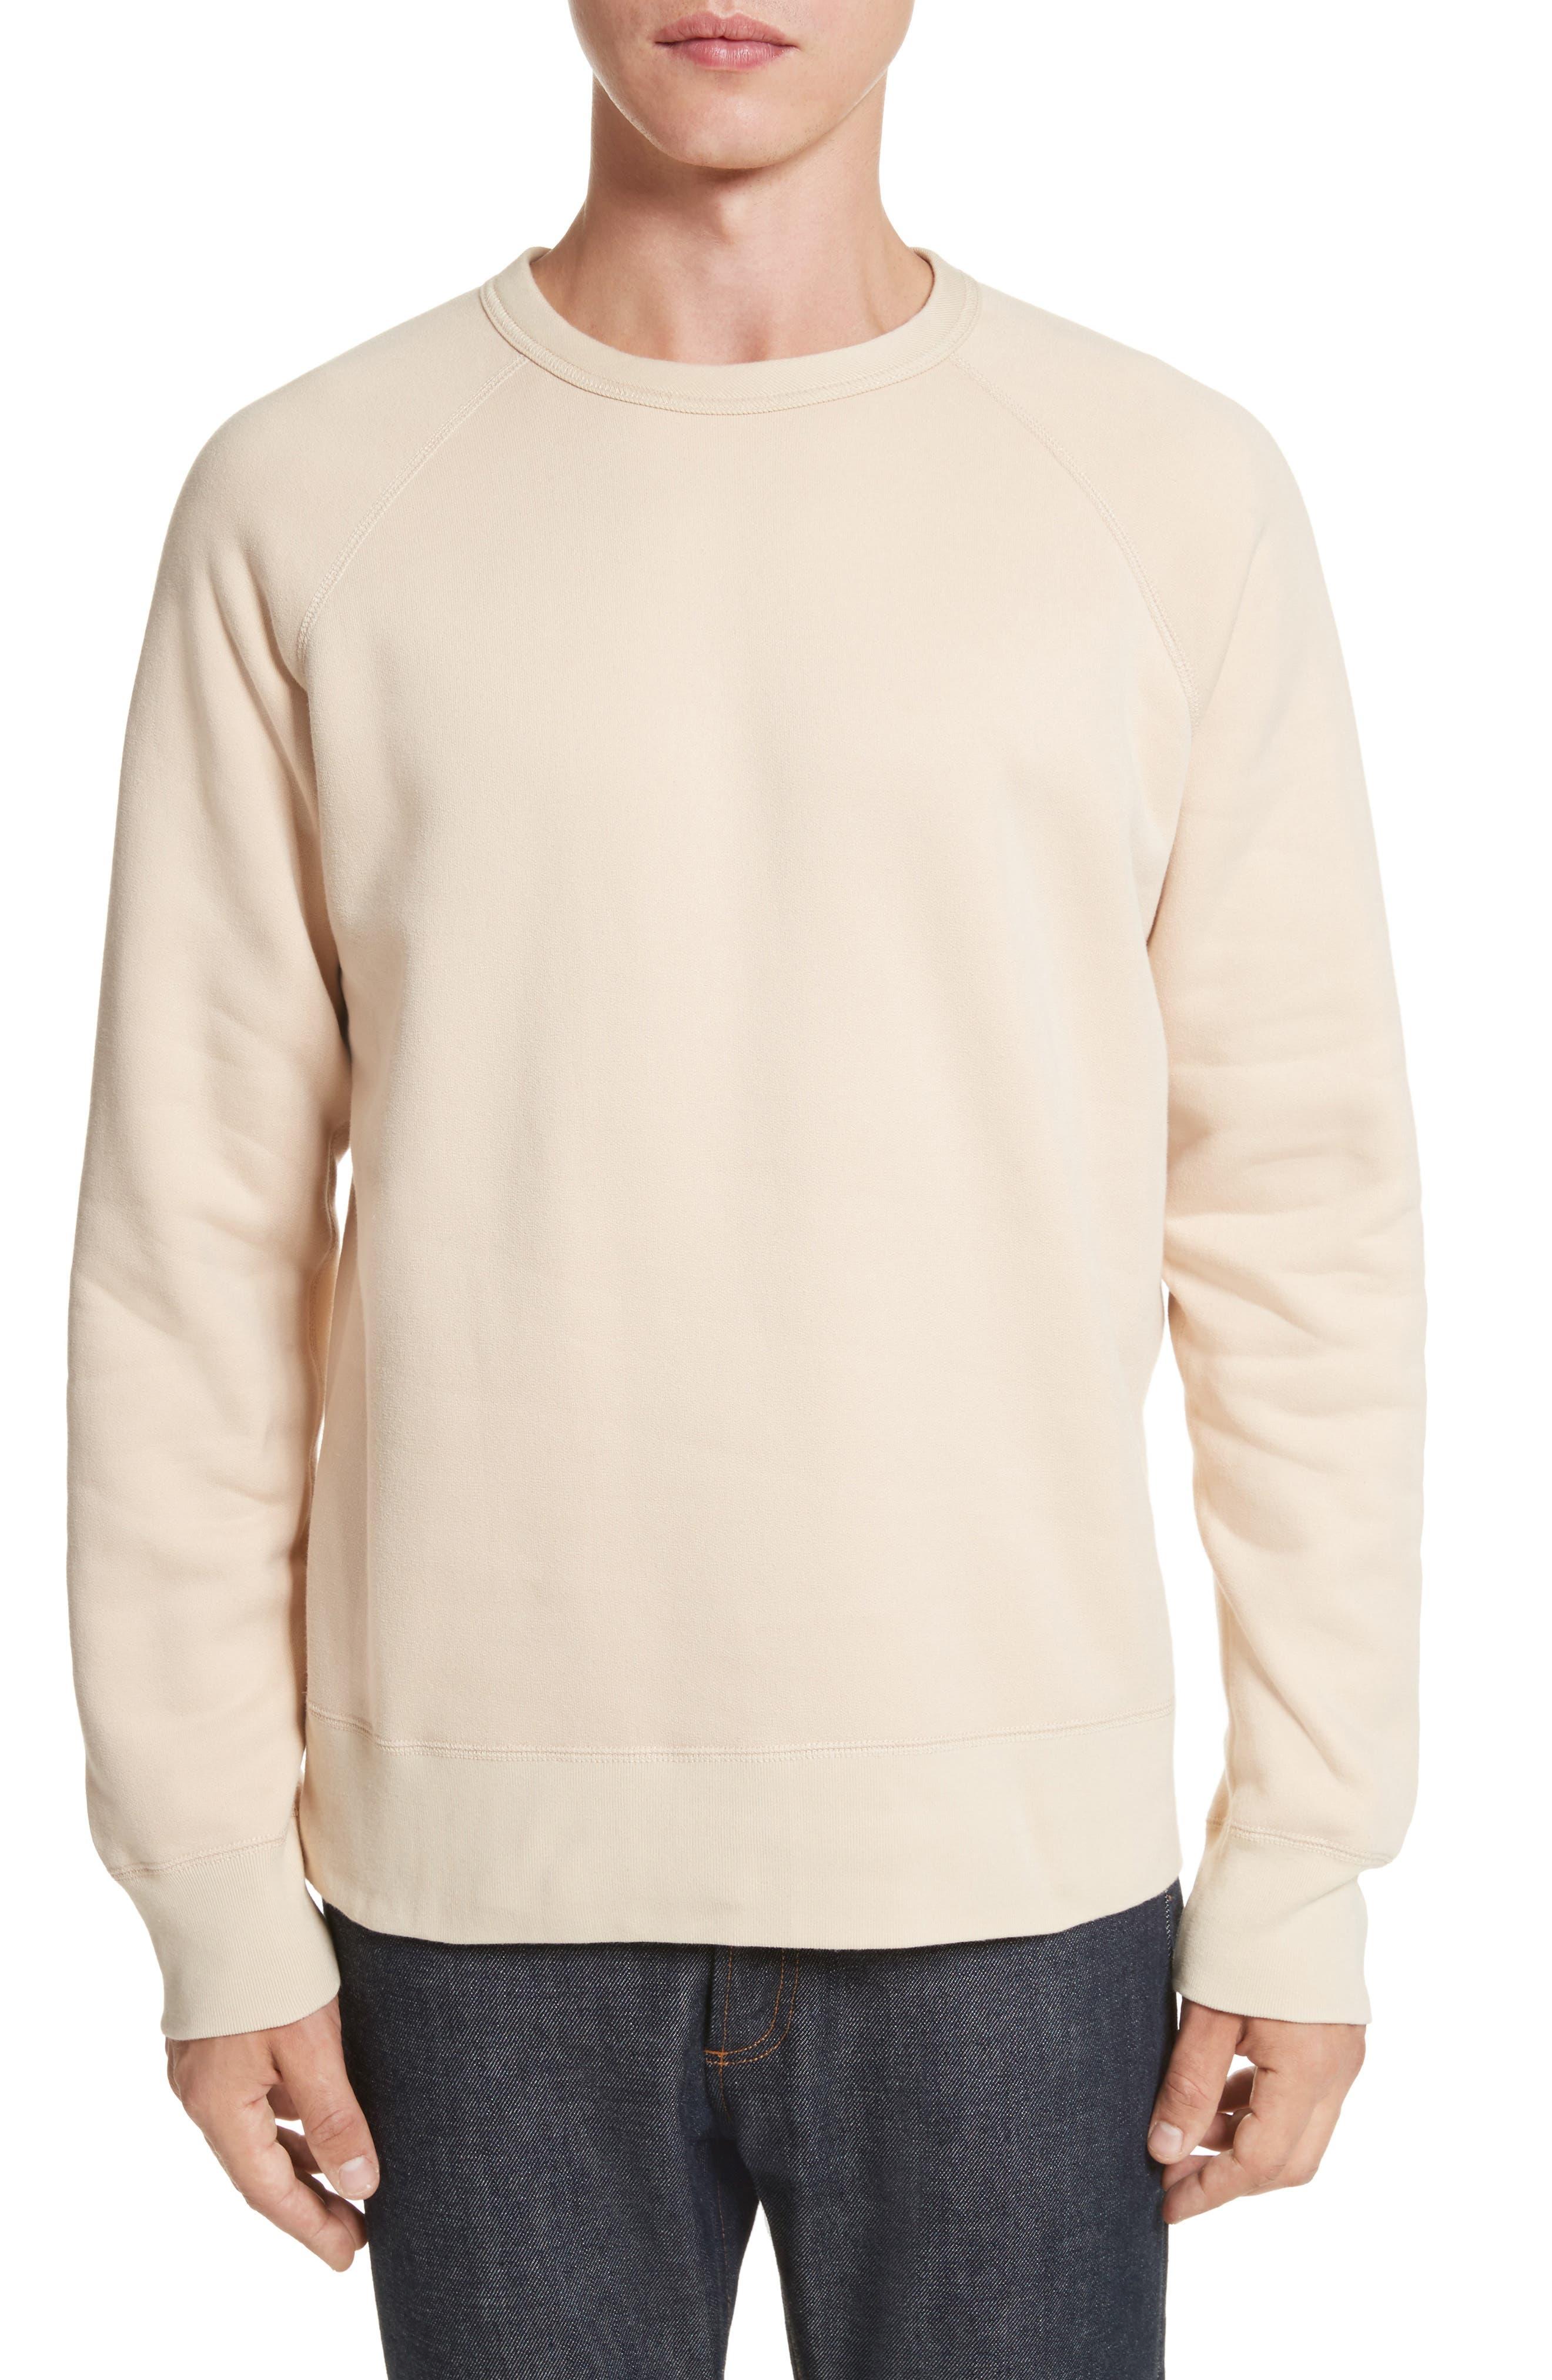 Main Image - OUR LEGACY Reversible Raglan Crewneck Sweatshirt